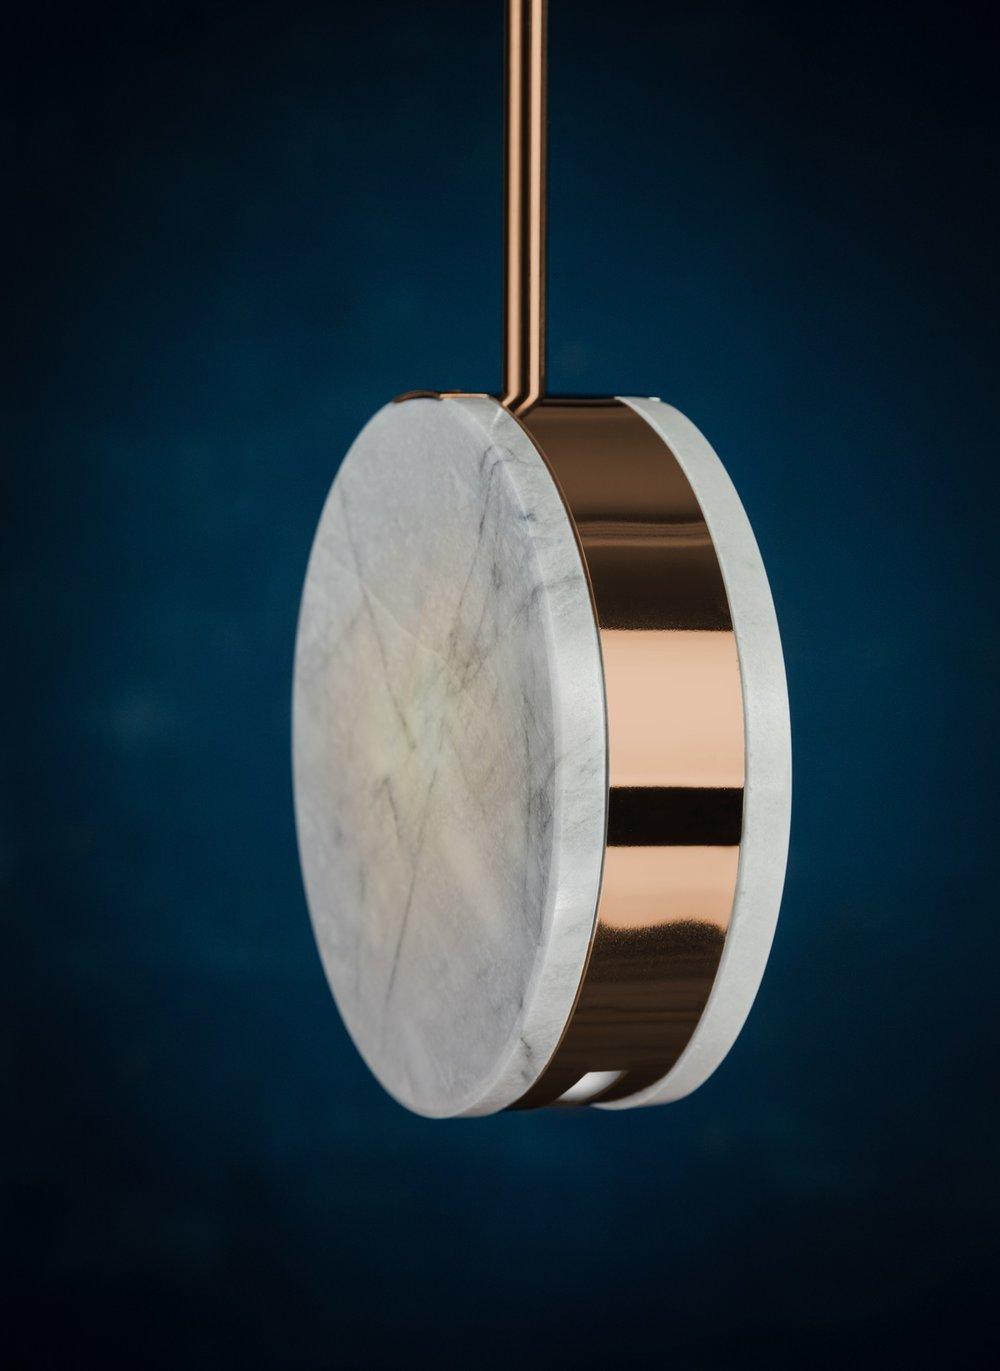 skeld-design-crios-copper-04.jpg